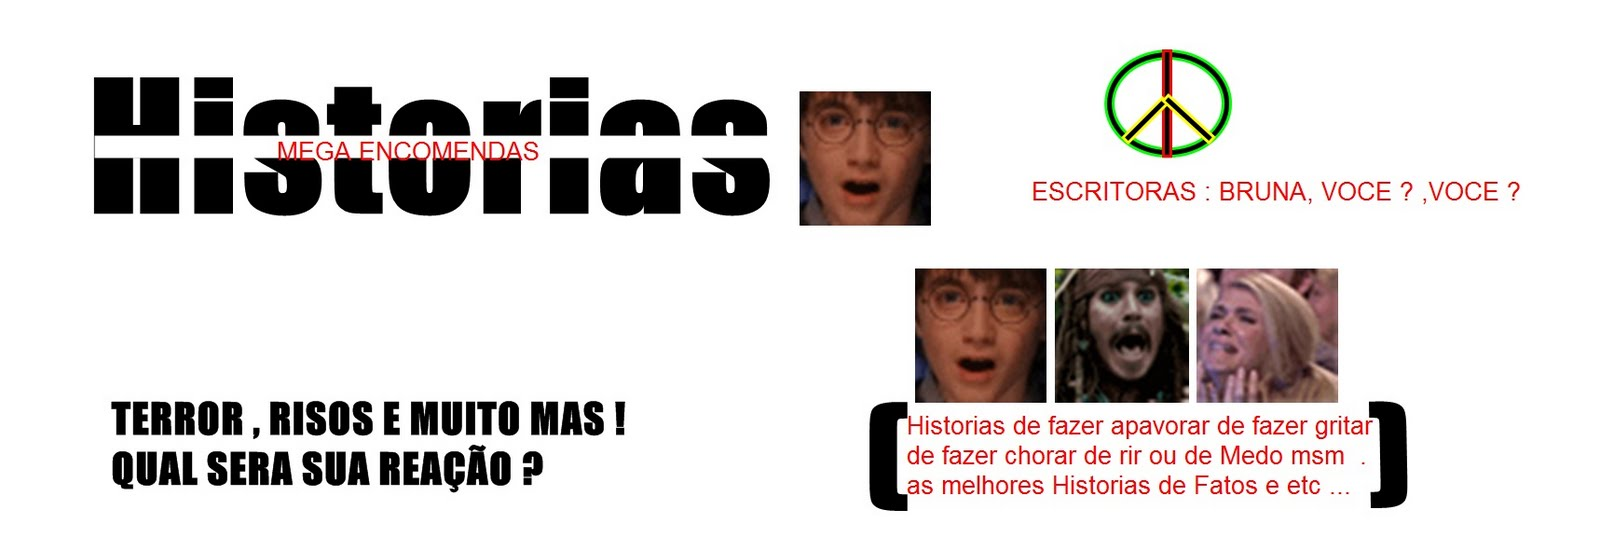 Historias -